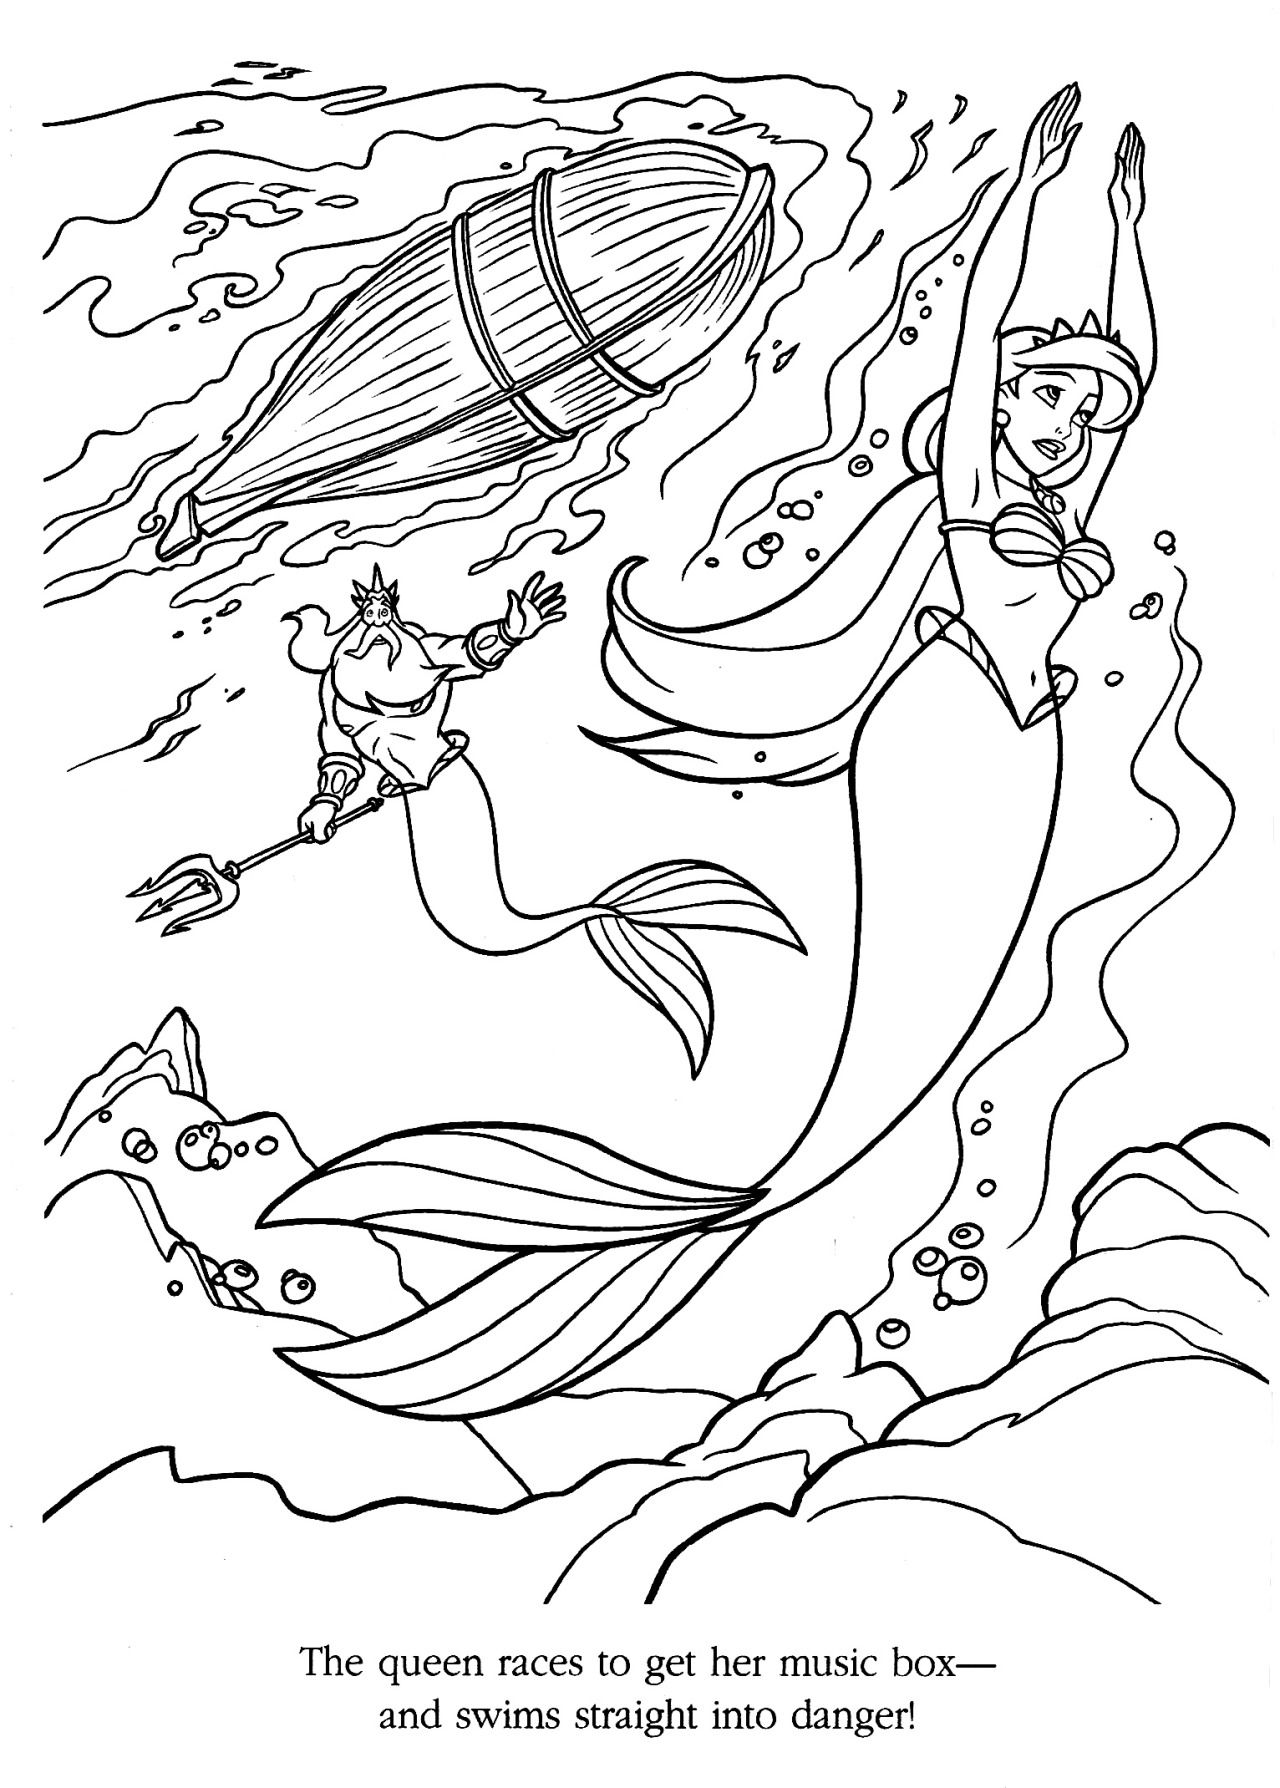 Coloriage La Petite Sirene Coloriage La Petite Sirene Coloriage